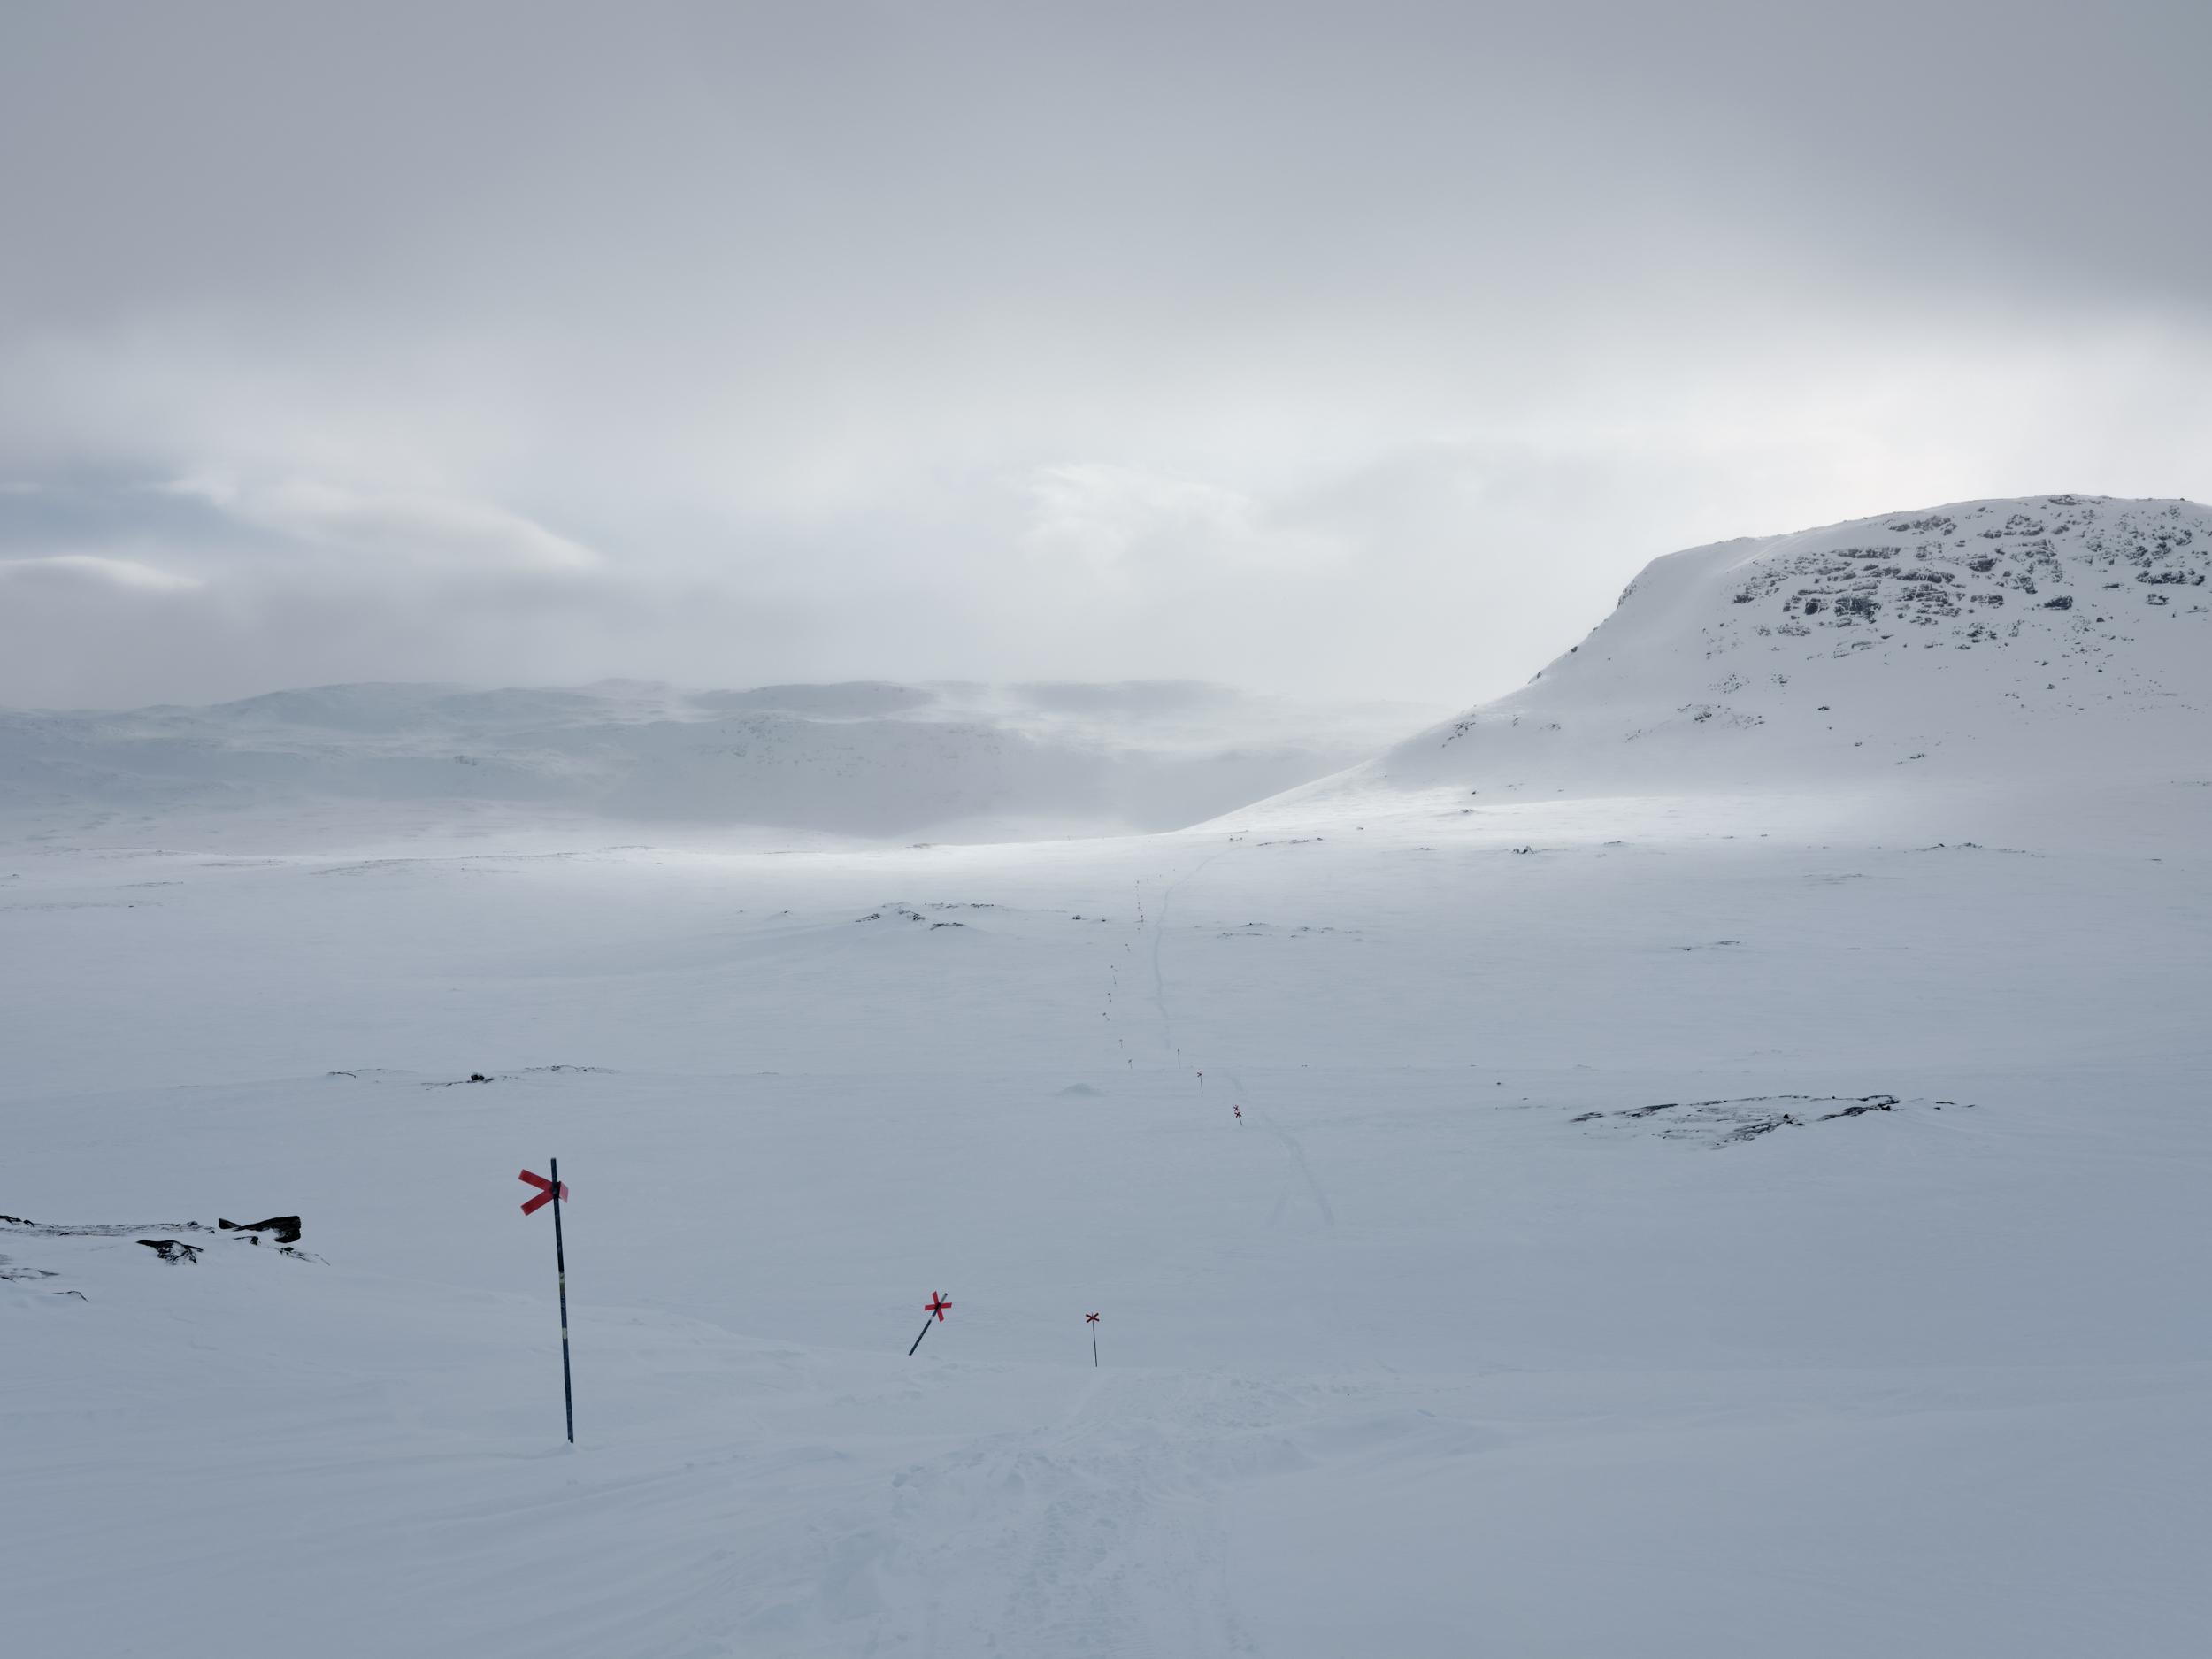 sgeo_20190329_Lappland_Winter_479.jpg